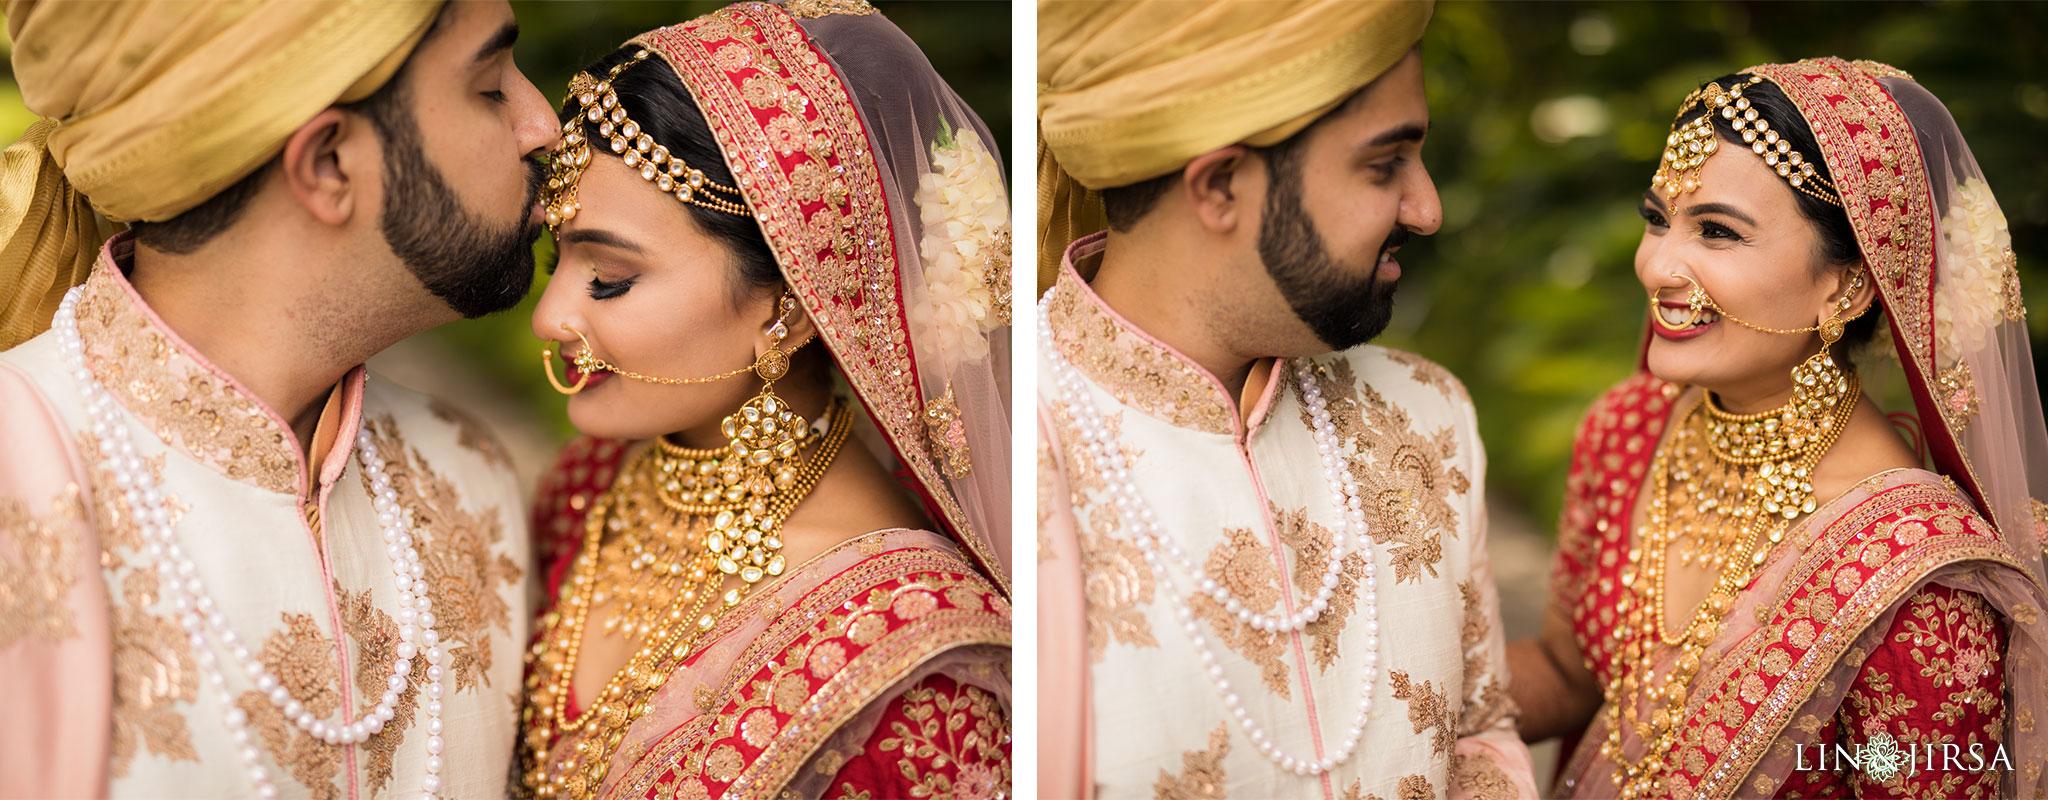 19 four seasons westlake village indian wedding photography